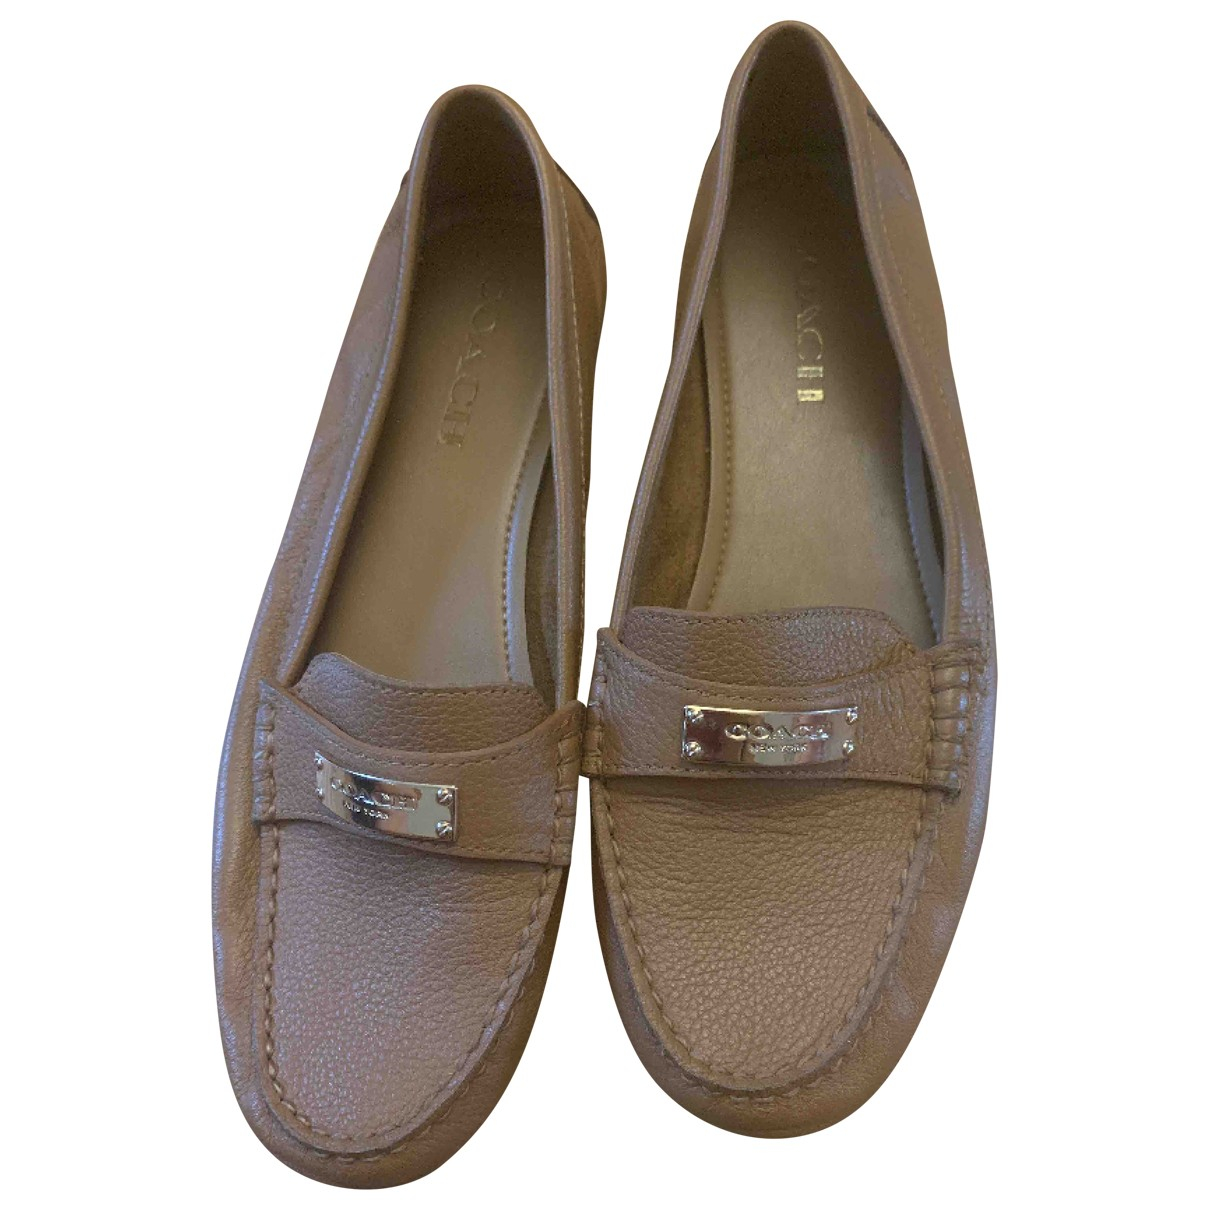 Coach N Camel Leather Flats for Women 38 EU